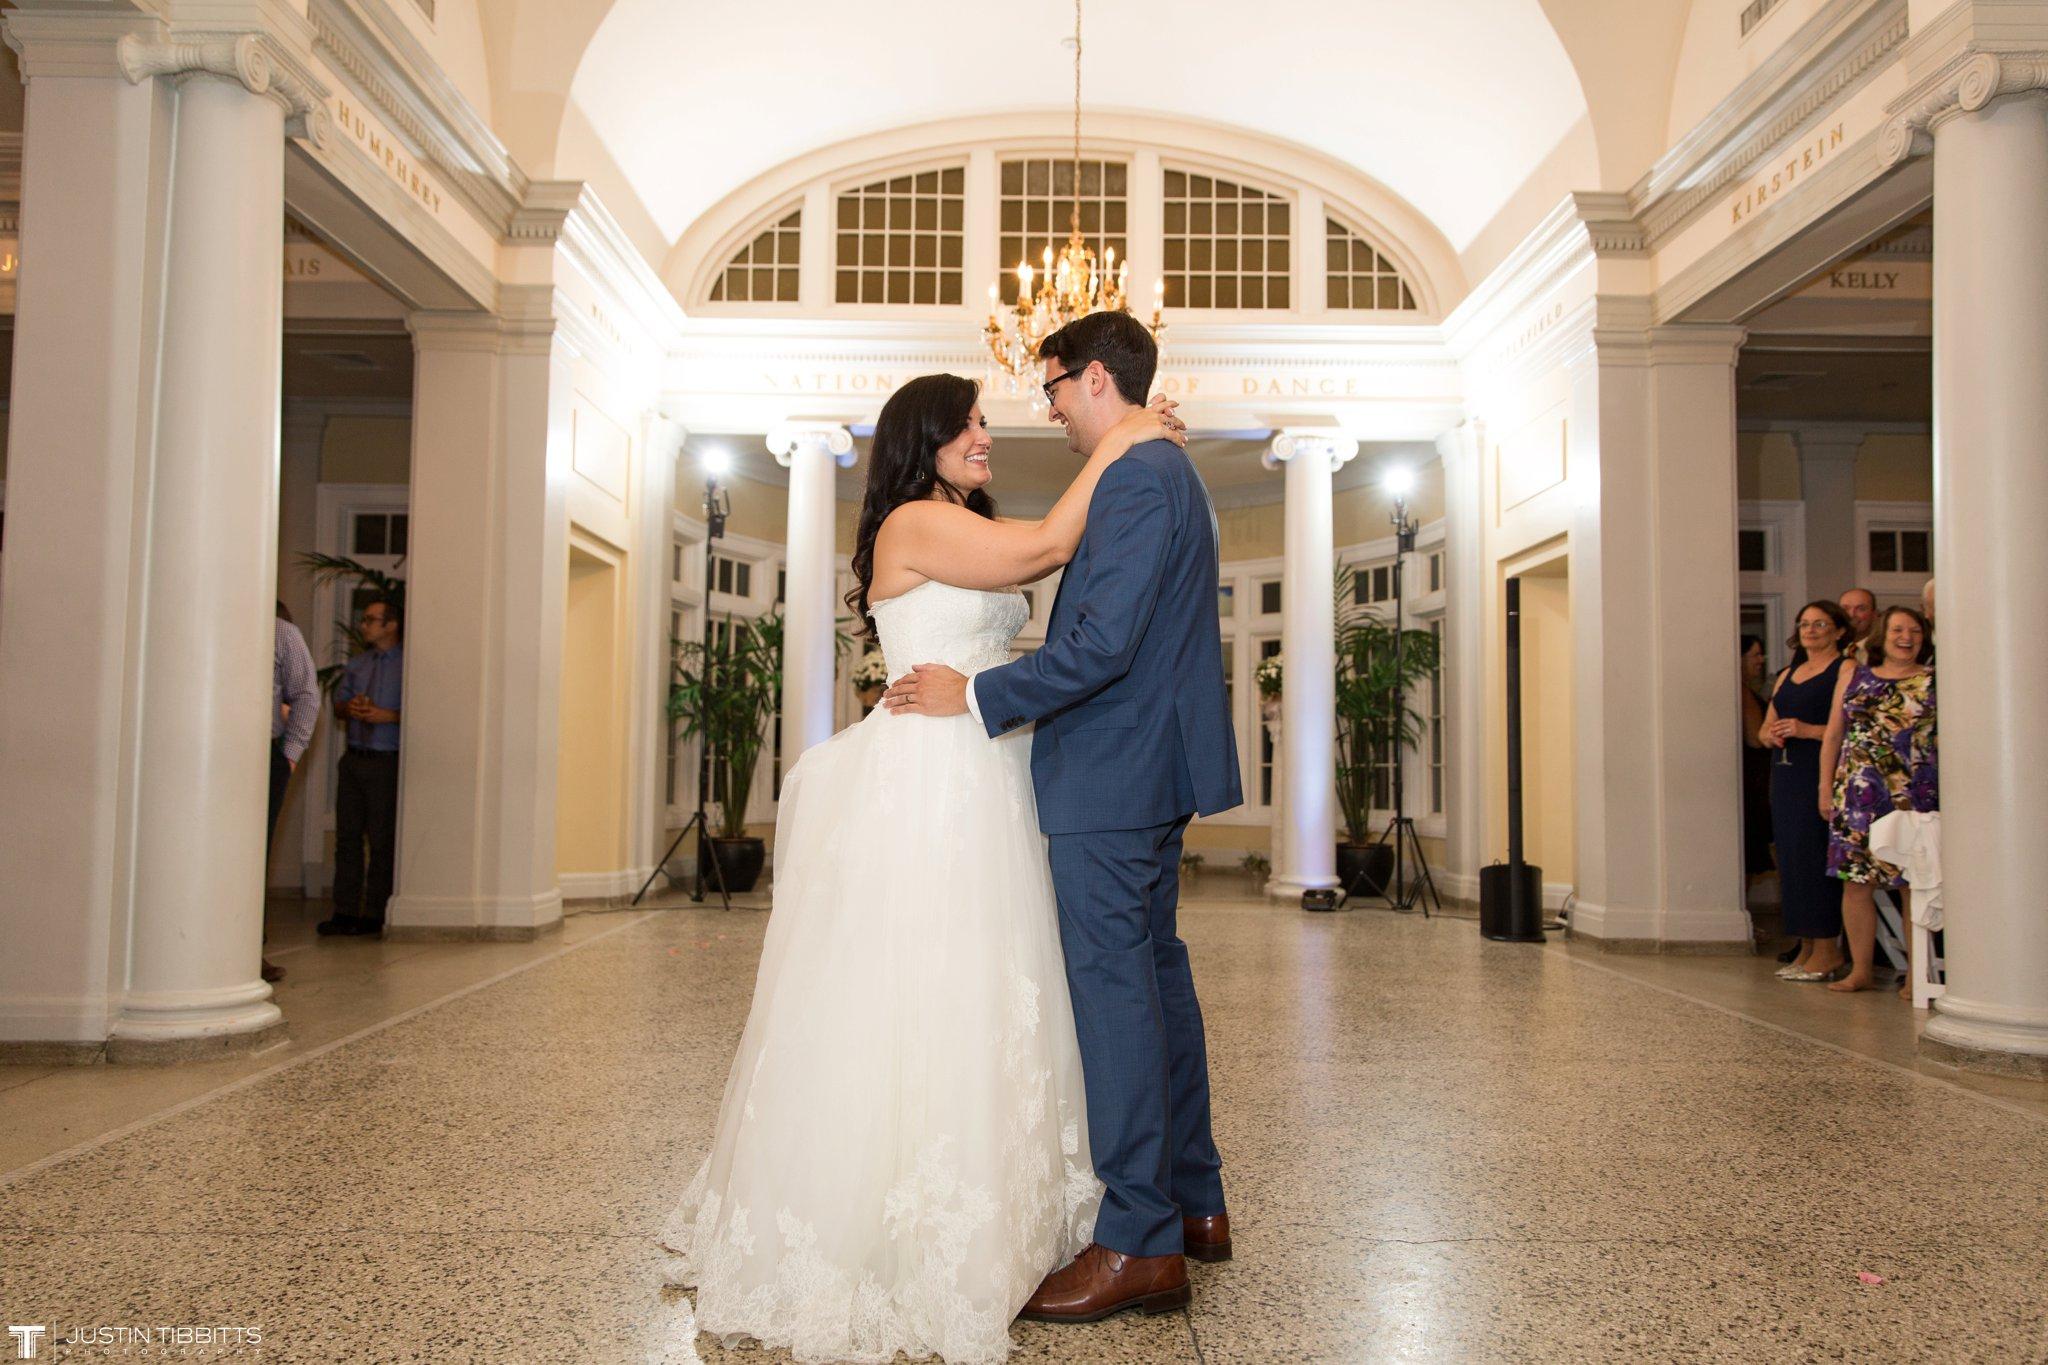 Jackie and Greg's Saratoga Museum of Dance Saratoga, NY Wedding Photos_0976